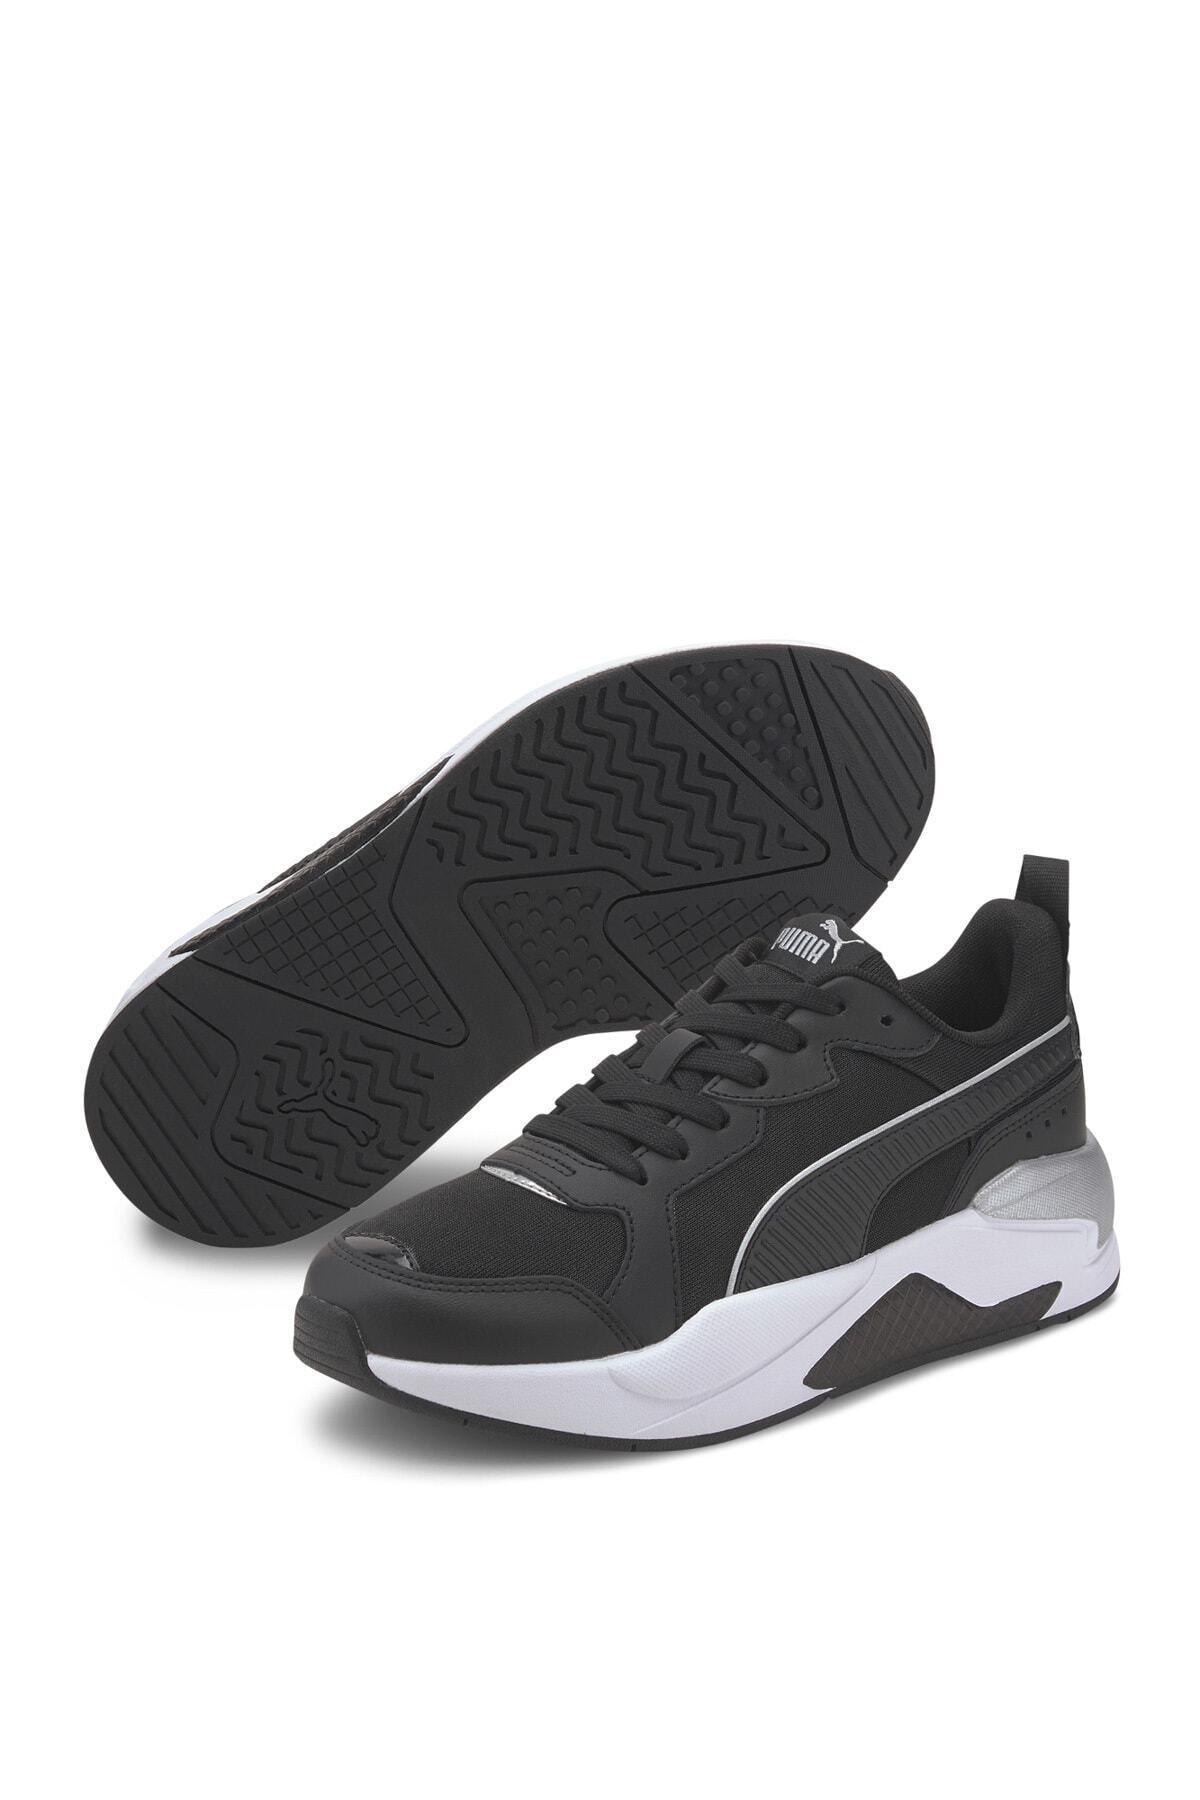 Puma X-RAY PATENT WN S PUMA BL Siyah Kadın Sneaker Ayakkabı 101085444 1